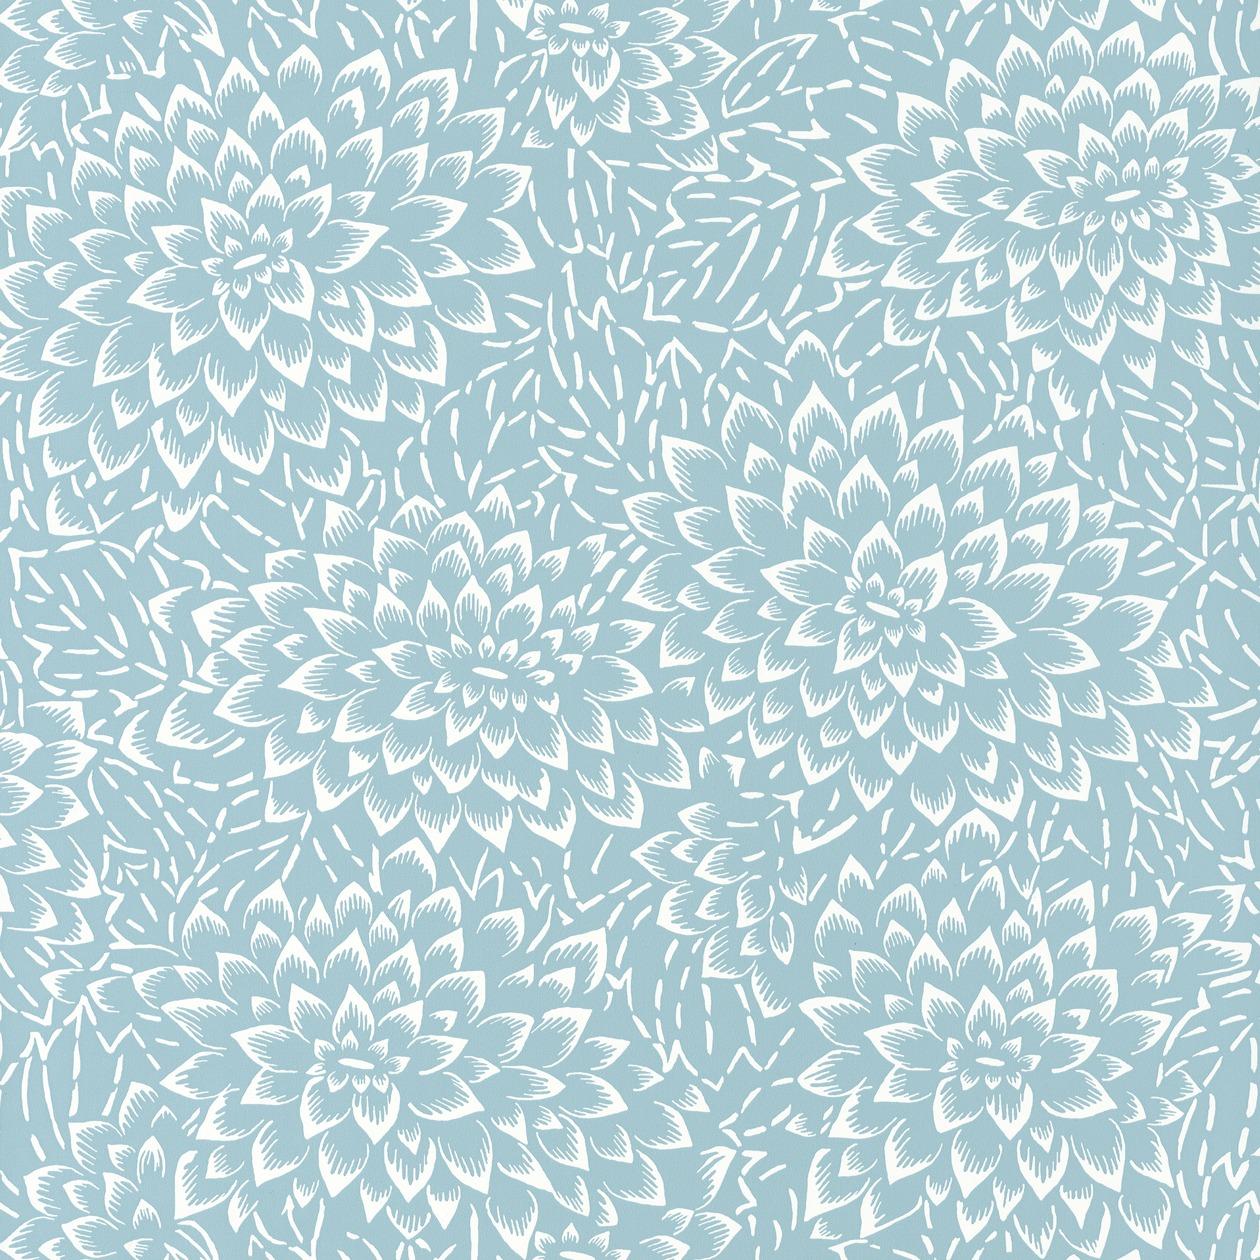 Világoskék lotuszvirág mintás tapéta, japán stílusban